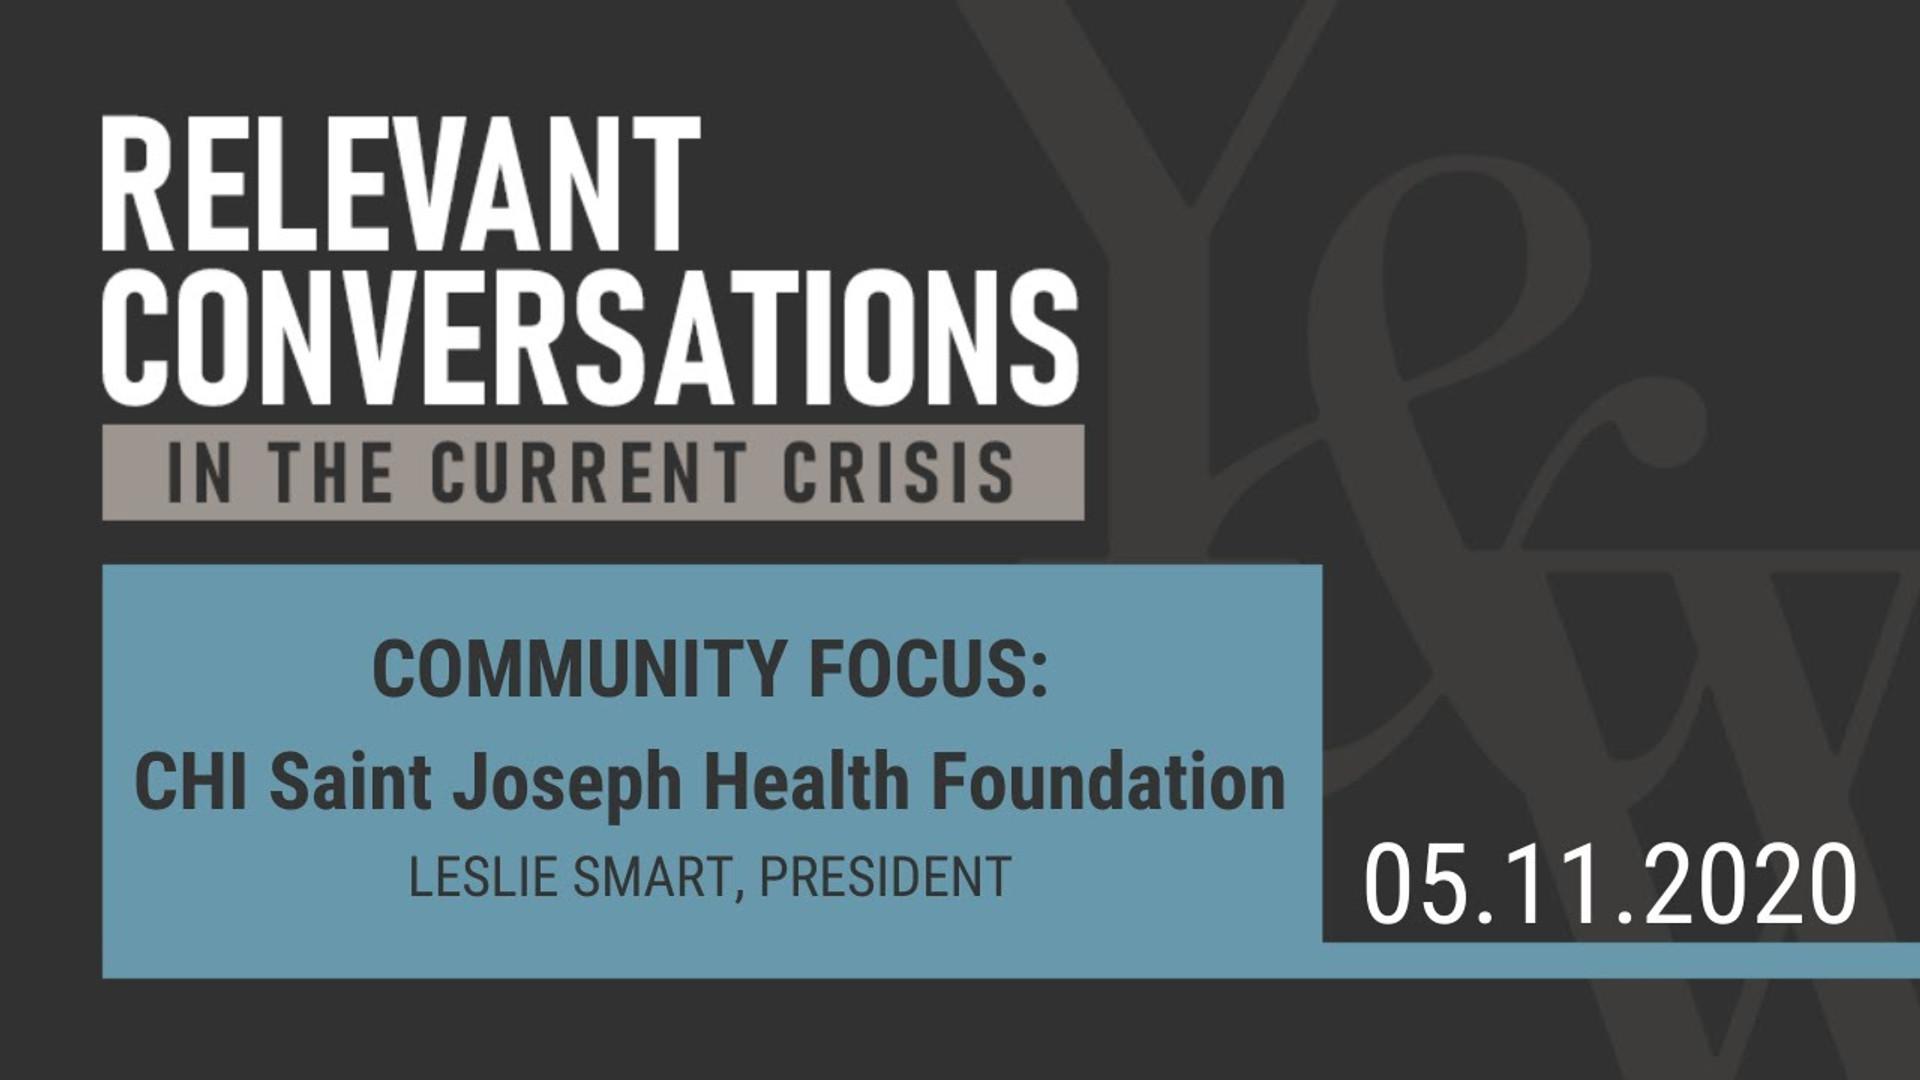 Community Focus:  CHI Saint Joseph Health Foundation